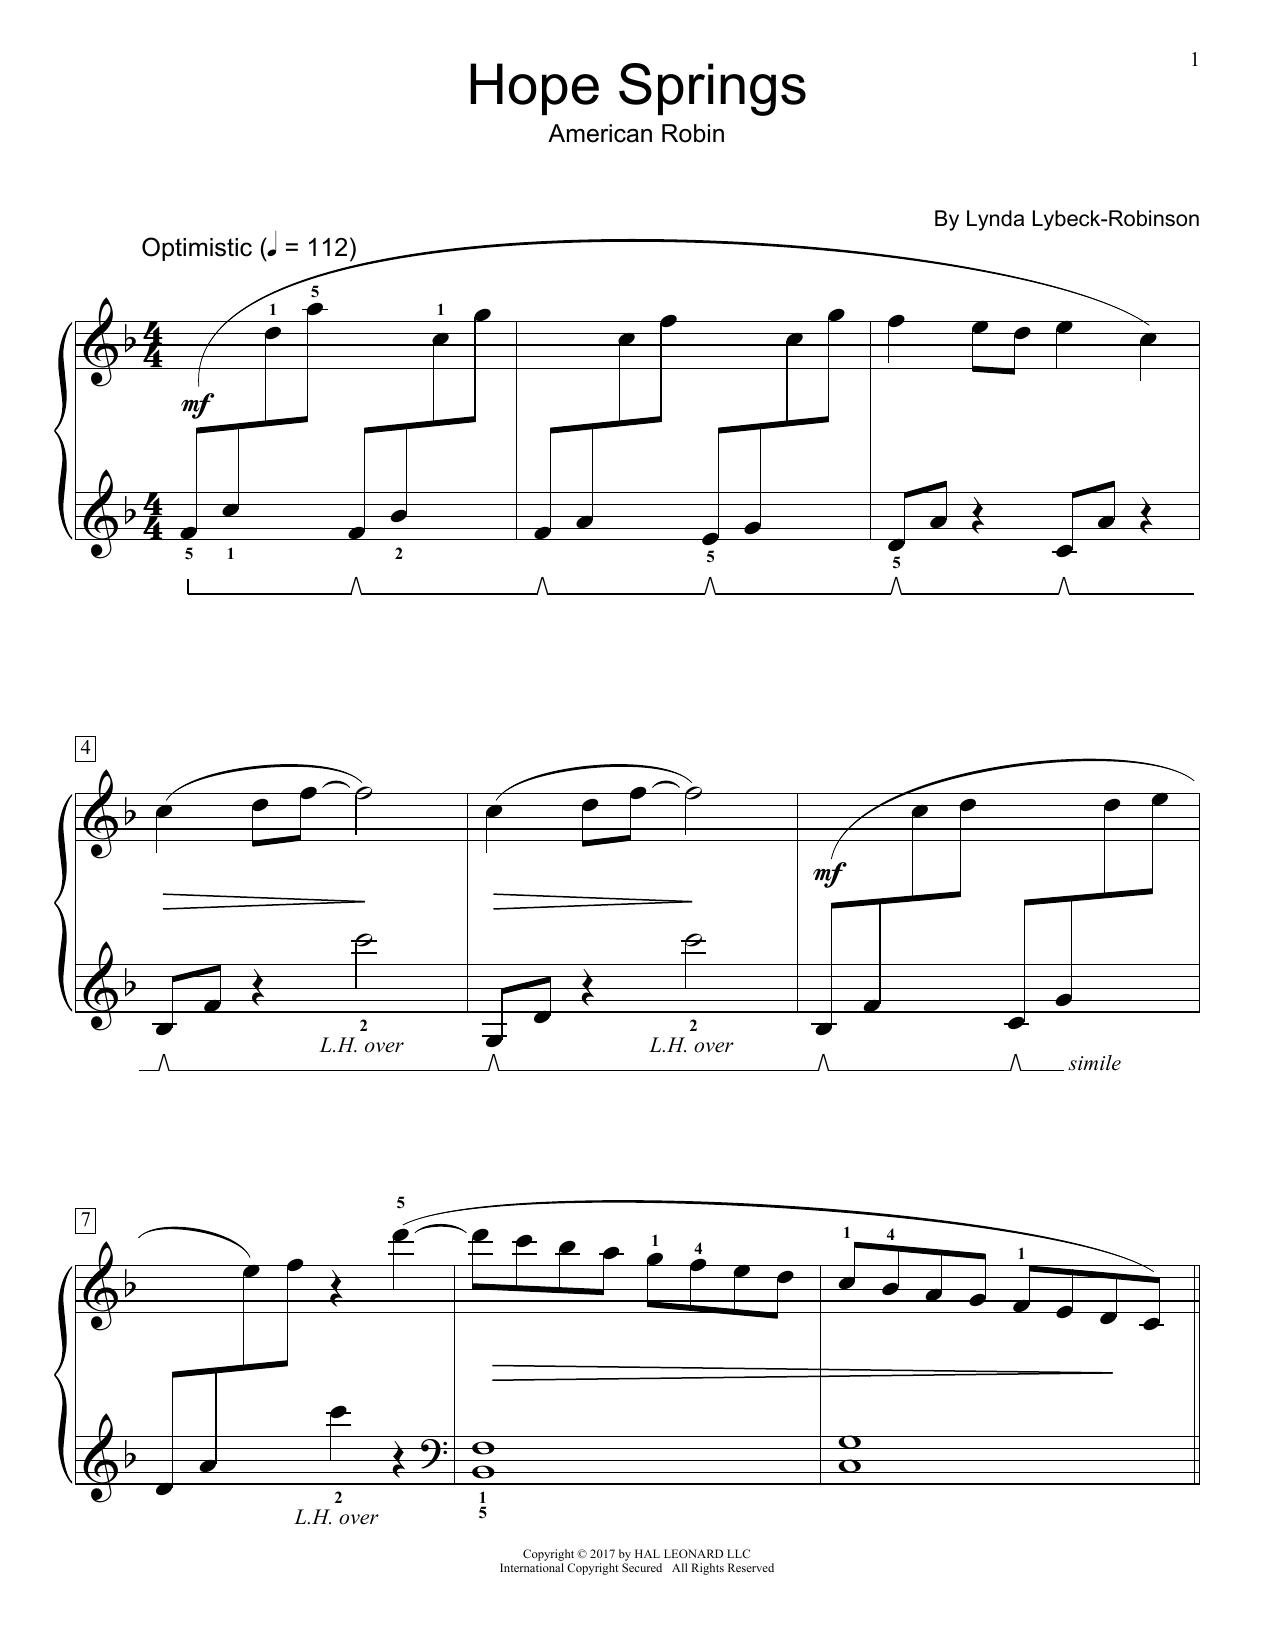 For the Birds - Early Intermediate/Intermediate Level Composer Showcase by Lynda Lybeck-Robinson